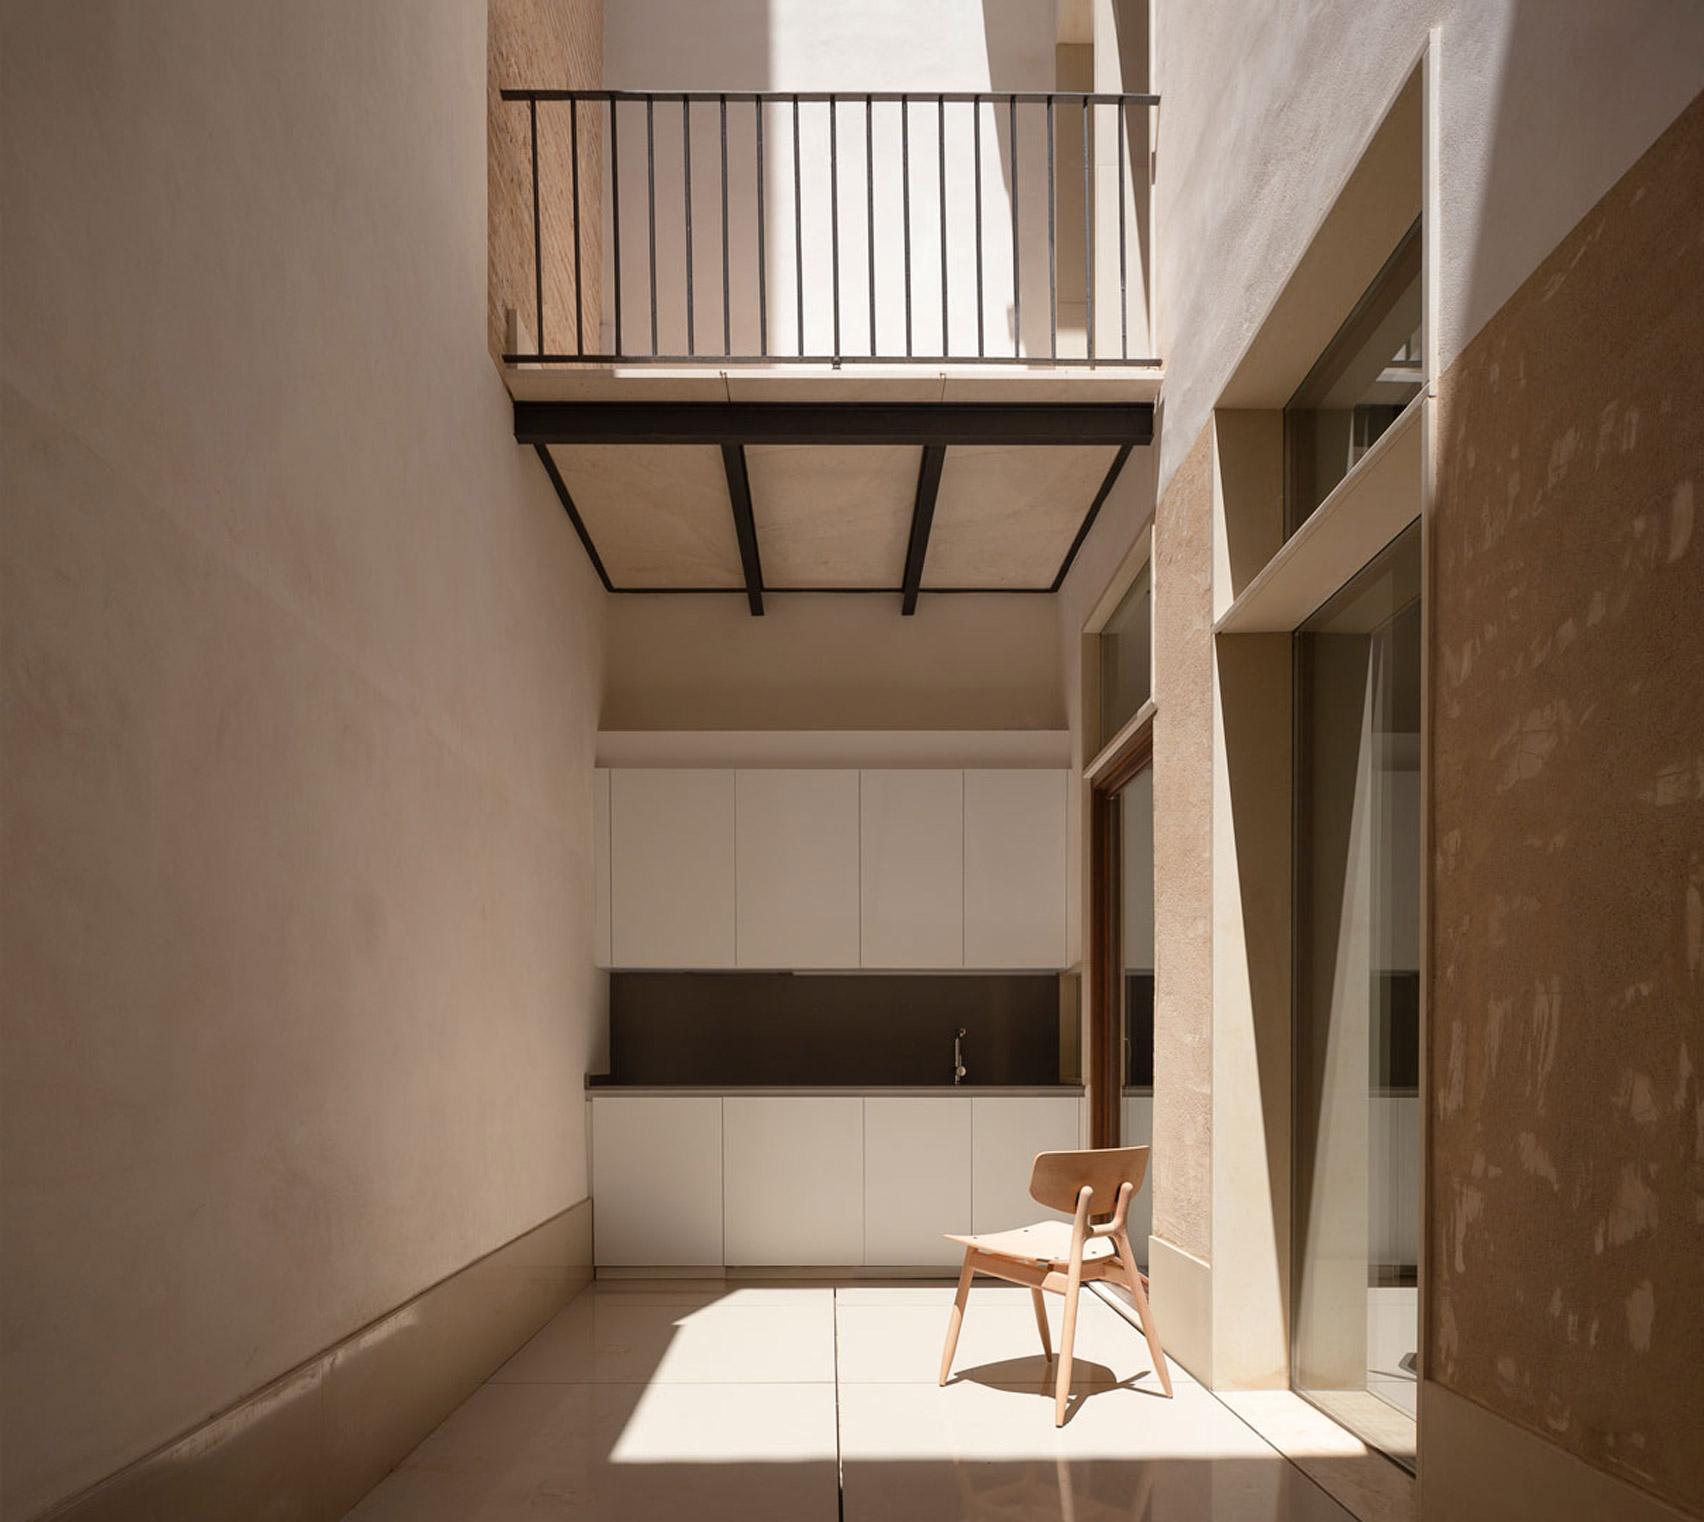 Un proyecto minimalista